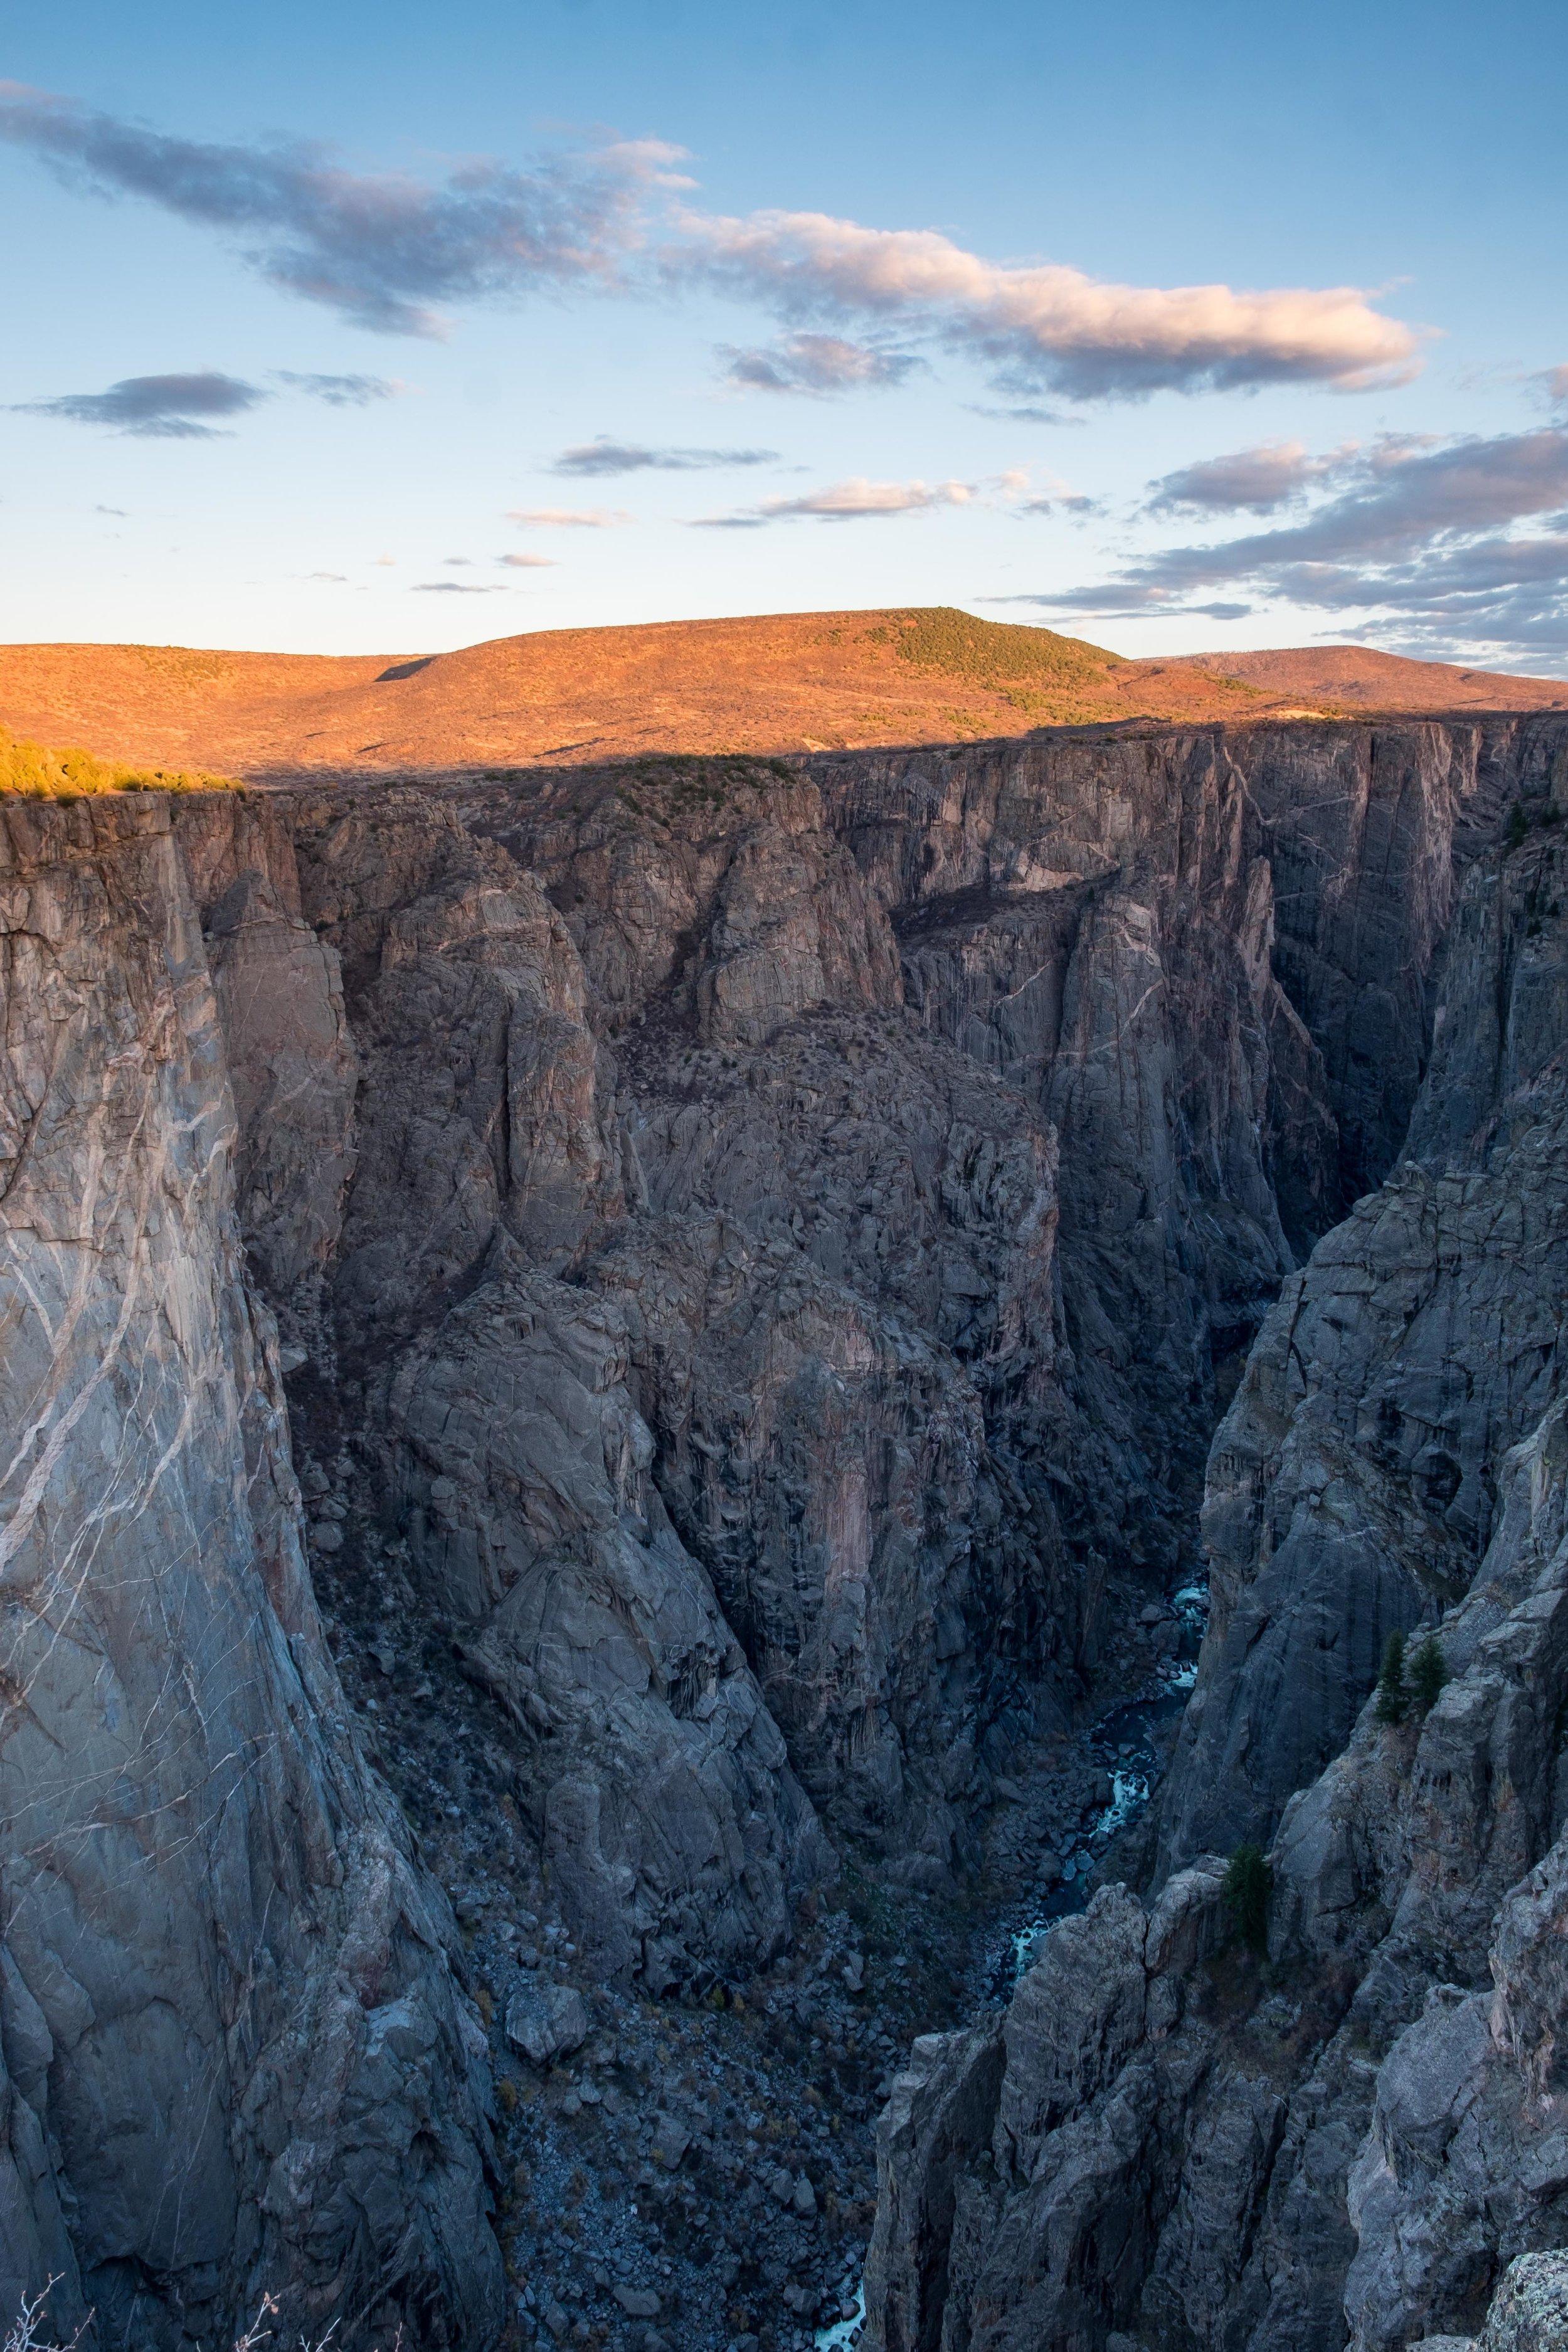 20161103-JI-Black Canyon of the Gunnison National Park-_DSF0676.jpg